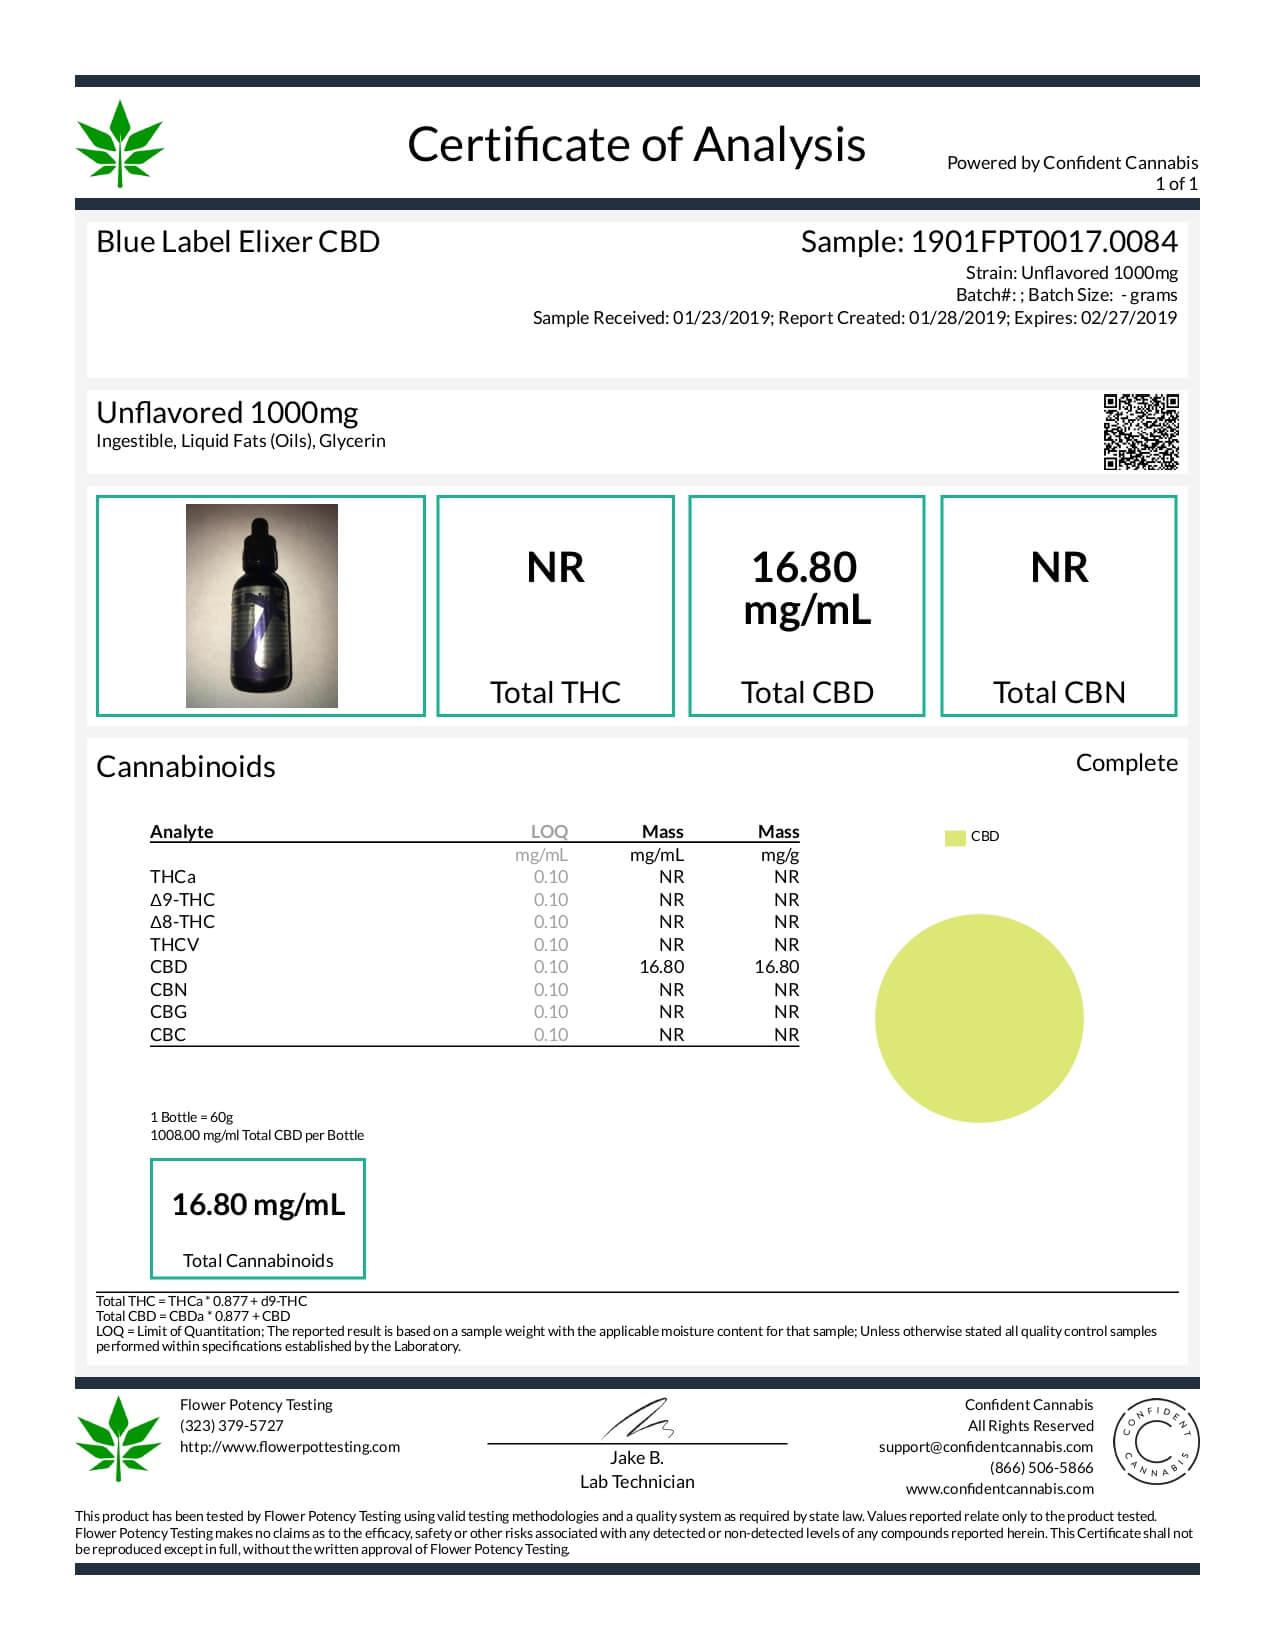 Blue Label CBD Vape Juice Unflavored Additive 1000mg Lab Report